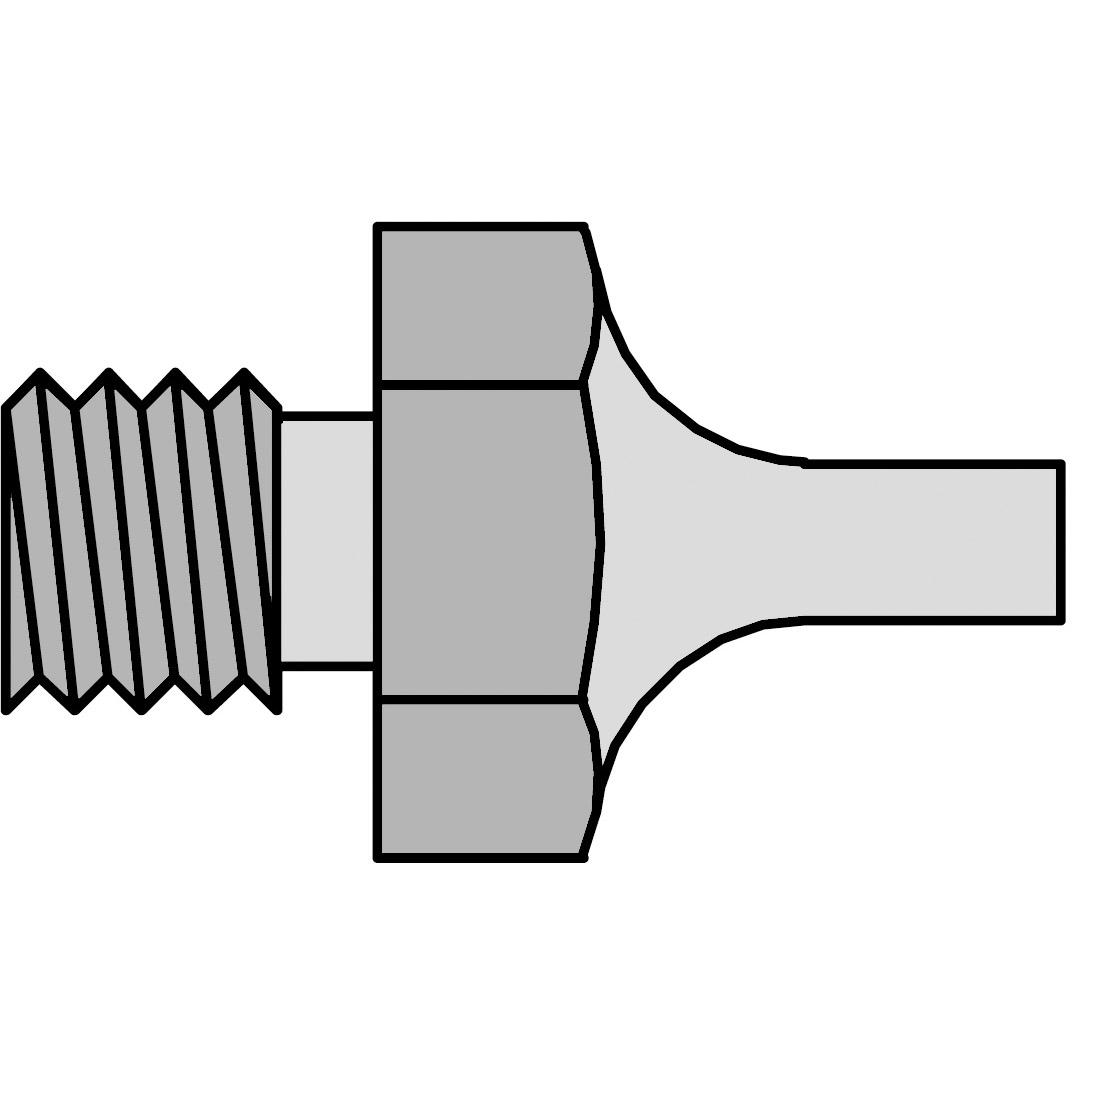 DS 120 Desoldering nozzle